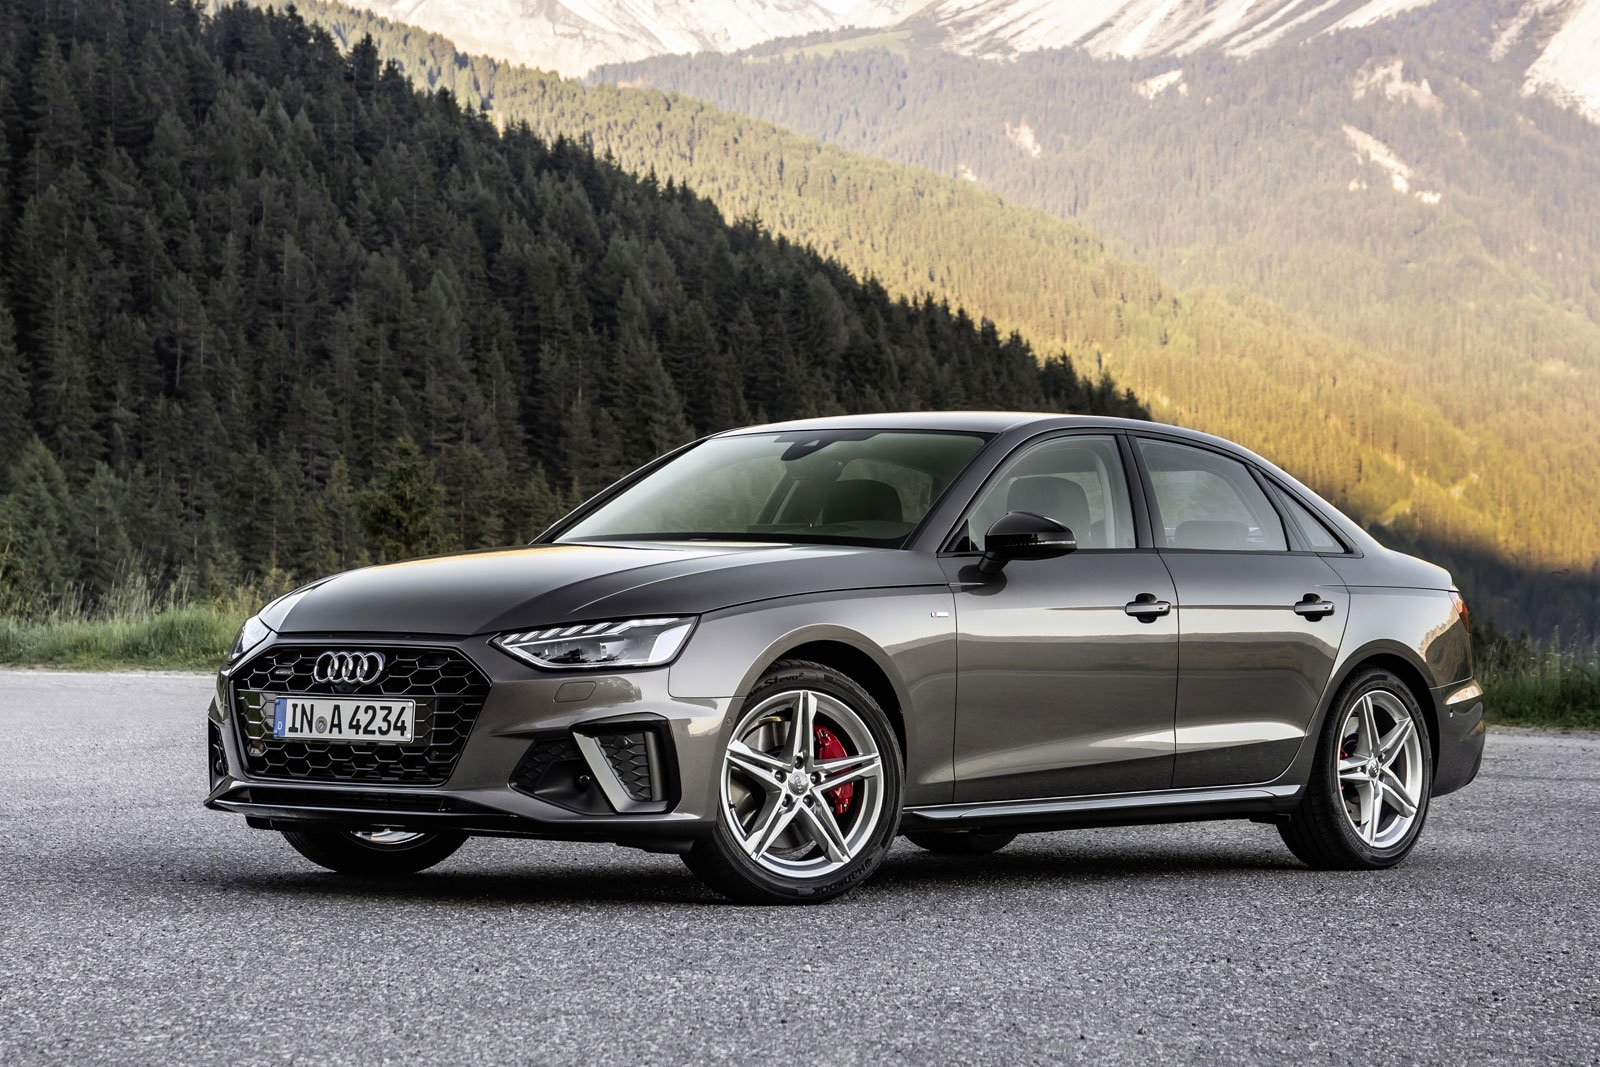 2021-Audi-A4-01